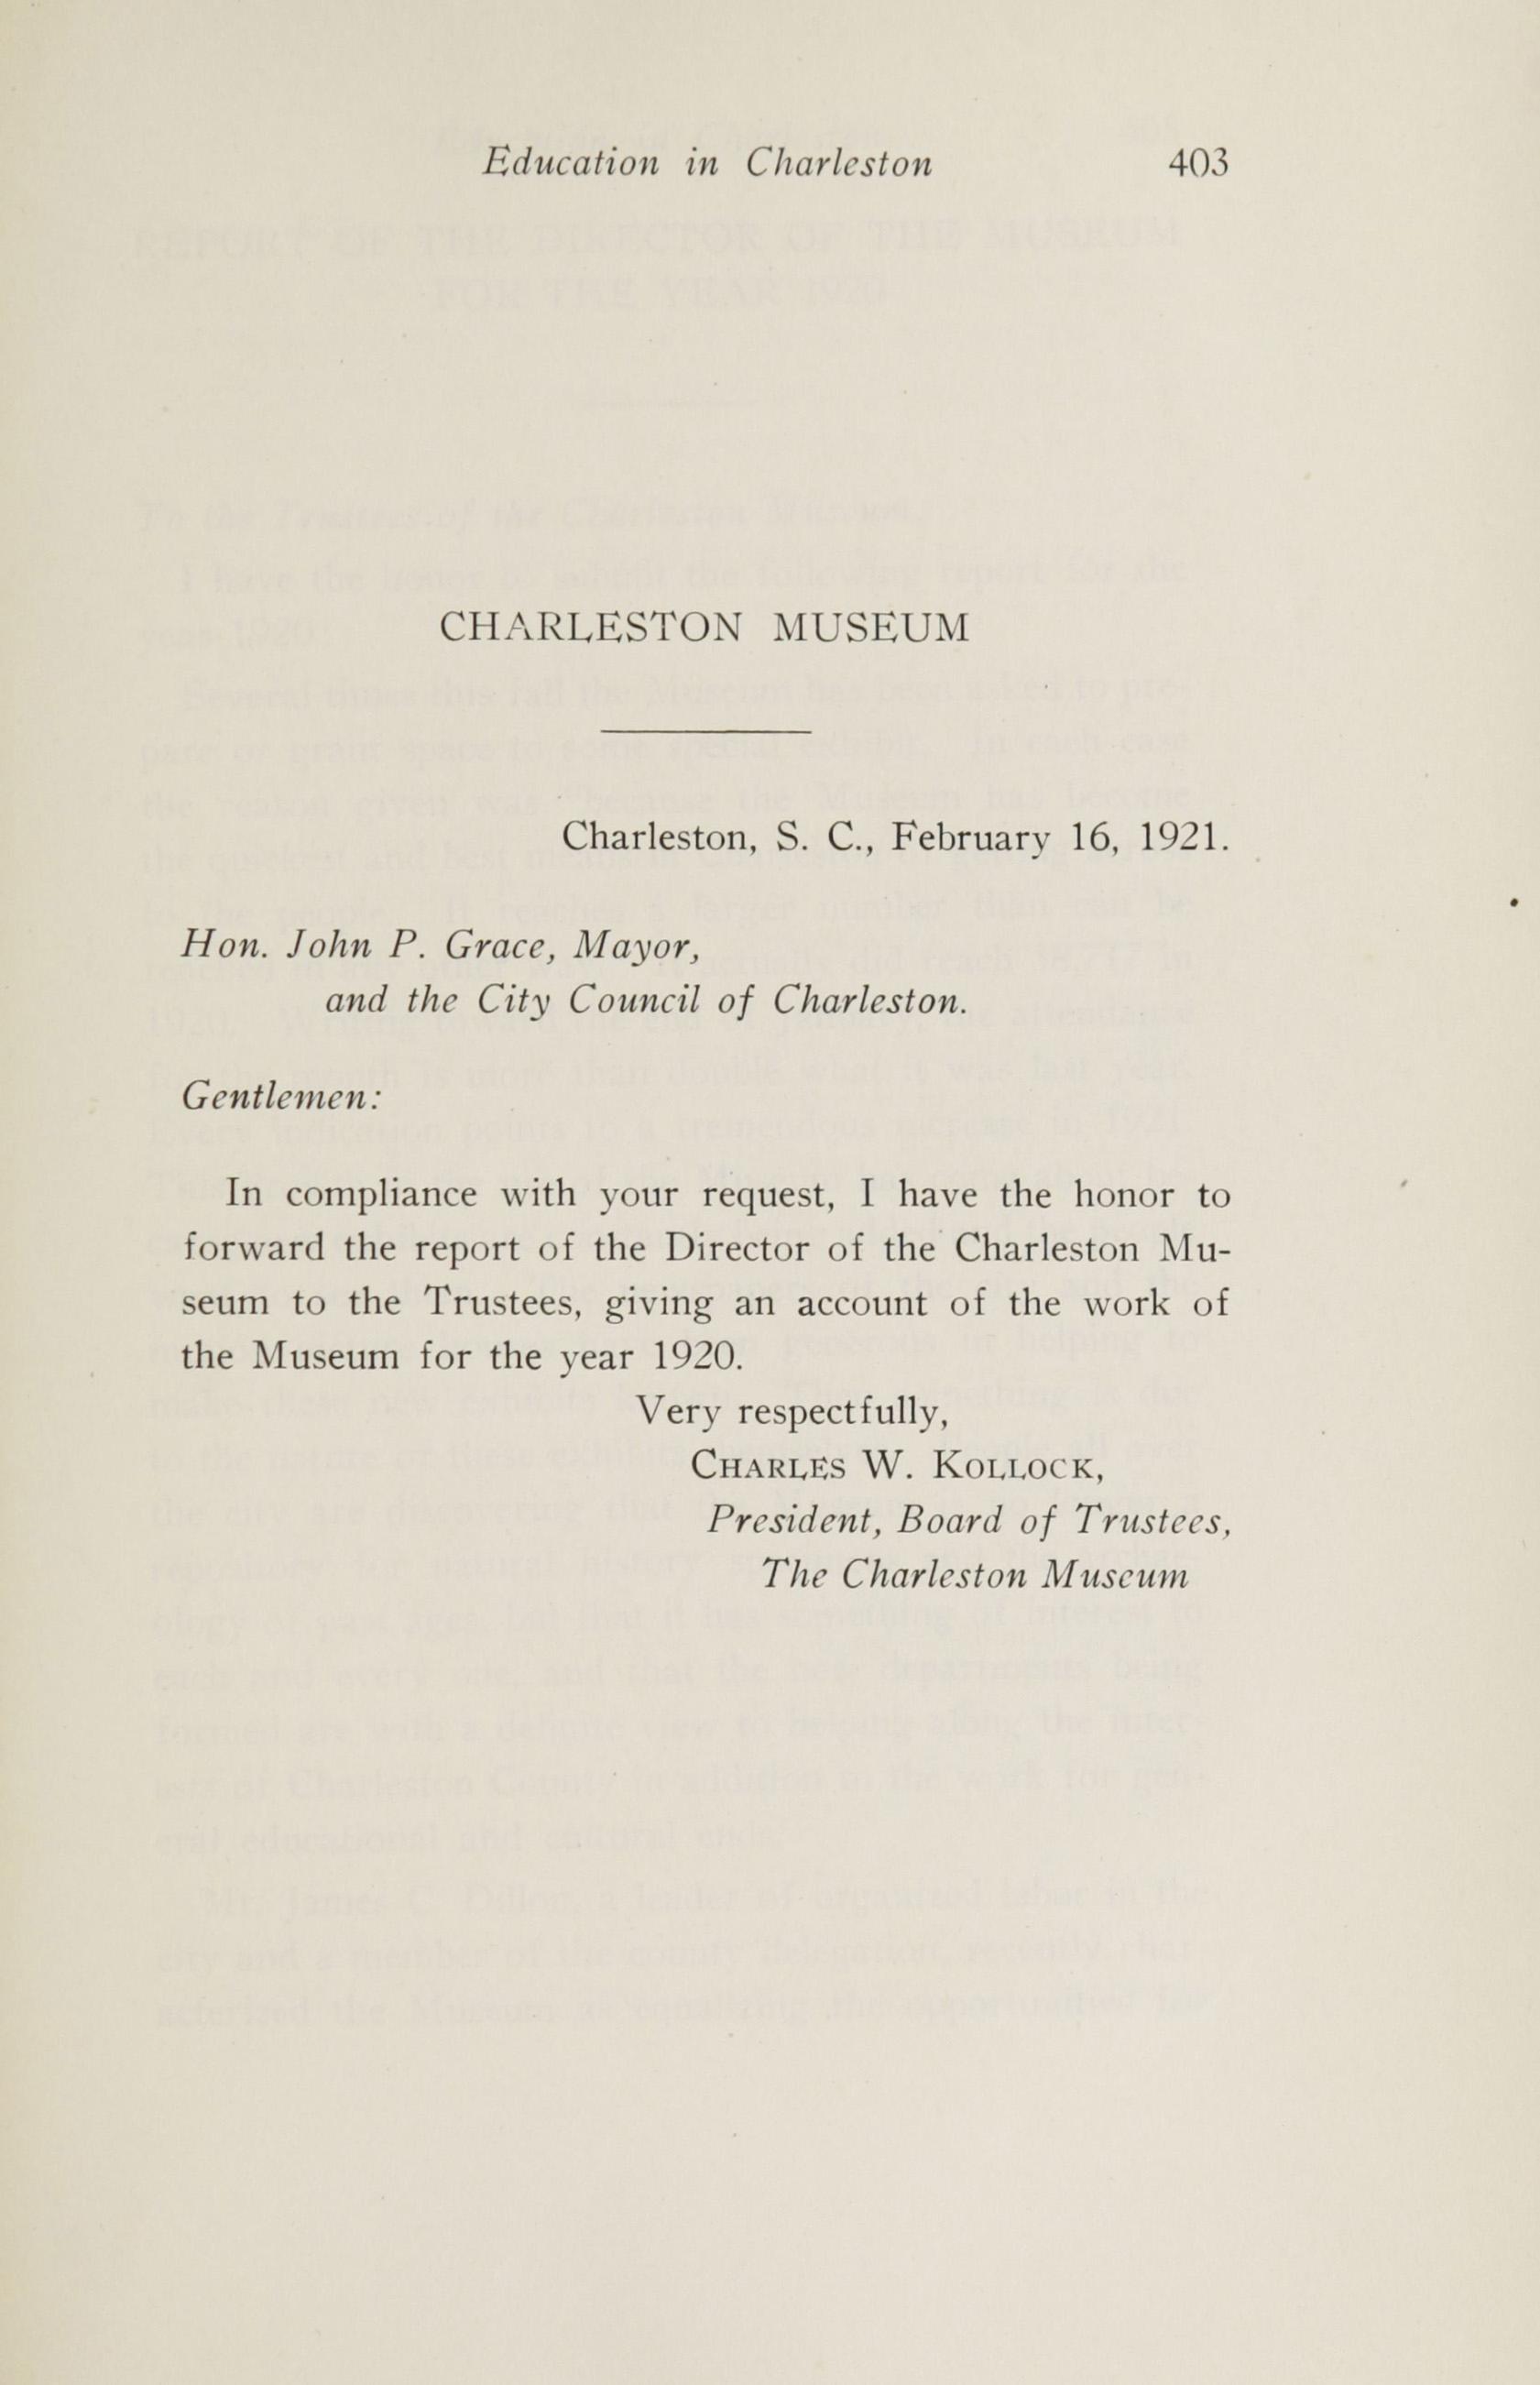 Charleston Yearbook, 1920, page 403